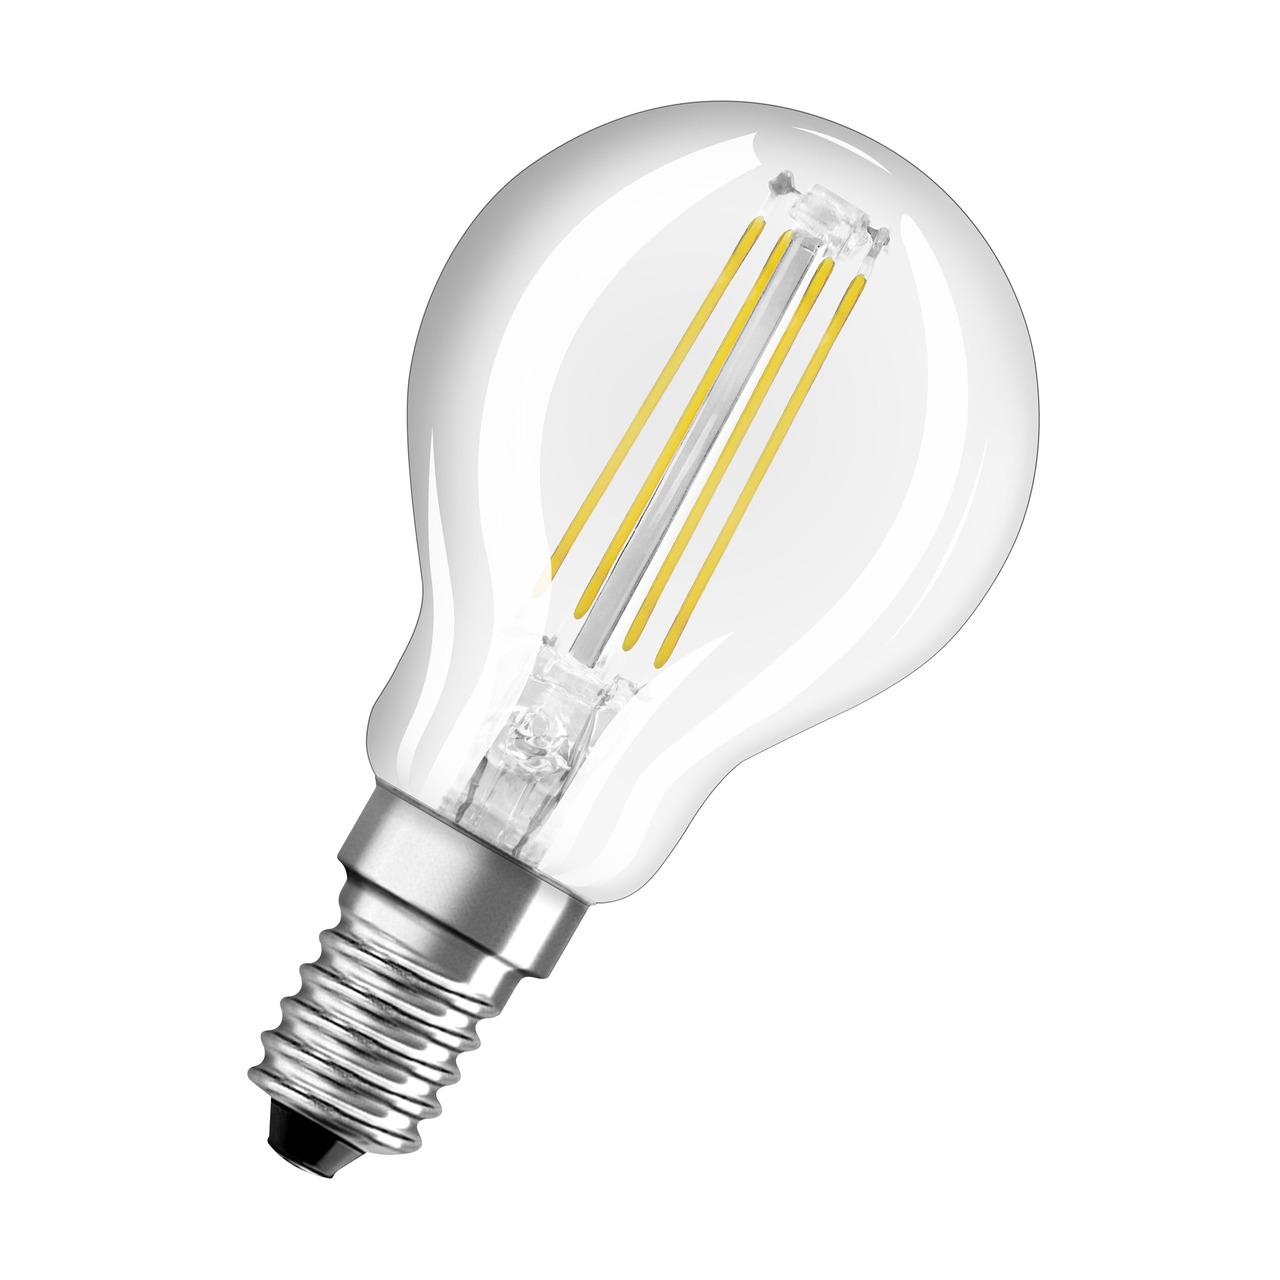 OSRAM 6-5-W-LED-Lampe P45- E14- 806 lm- warmweiss- klar- dimmbar